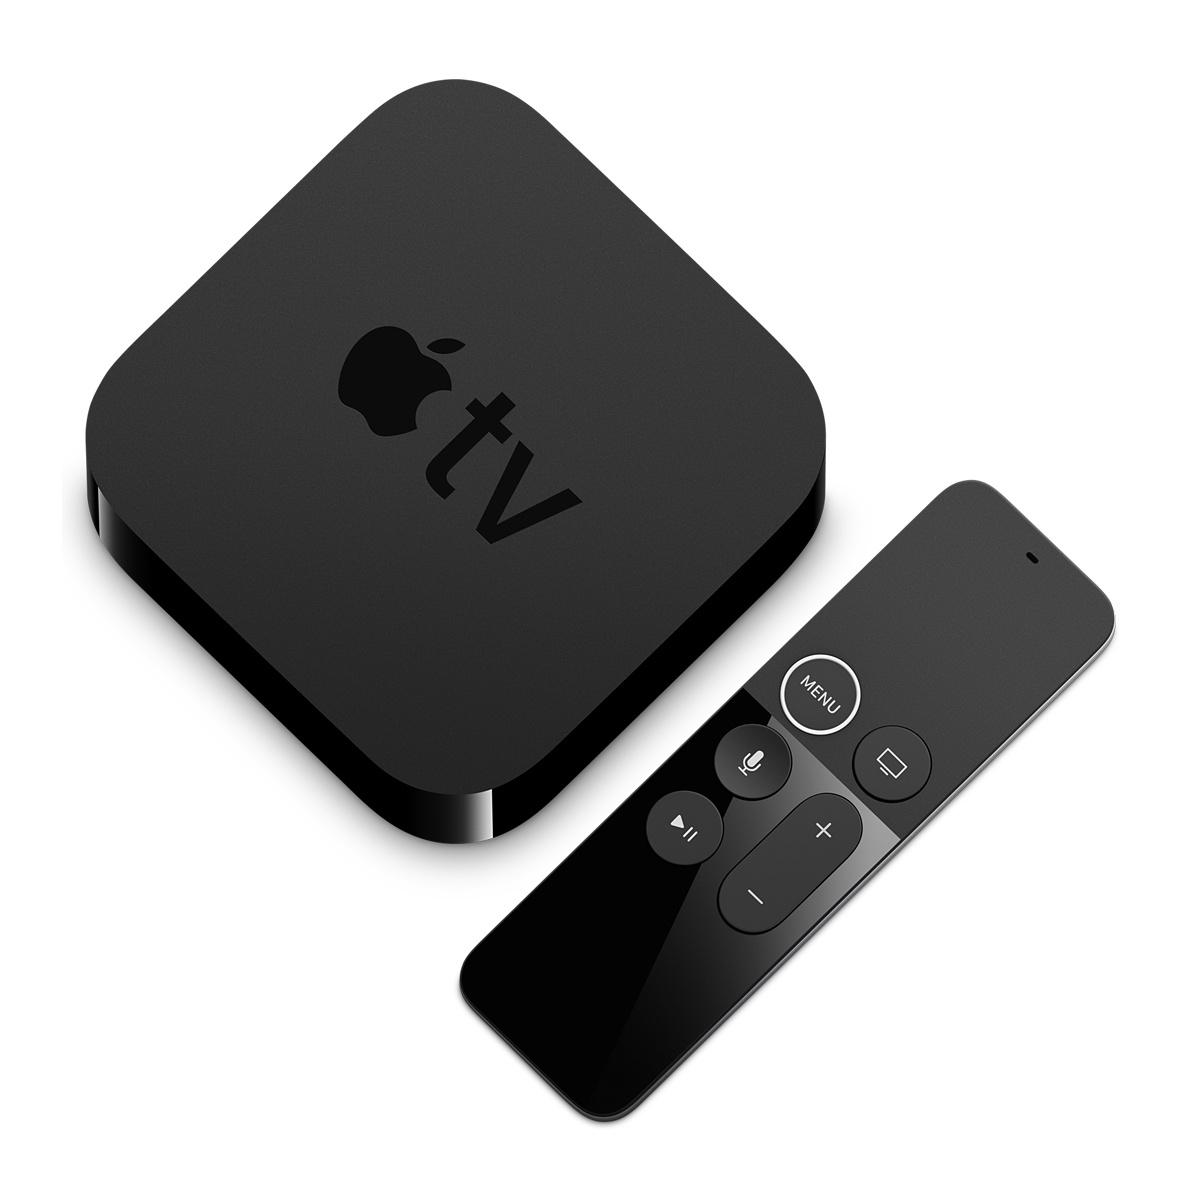 Apple TV 32 GB Wi-Fi Ethernet LAN Black Full HD